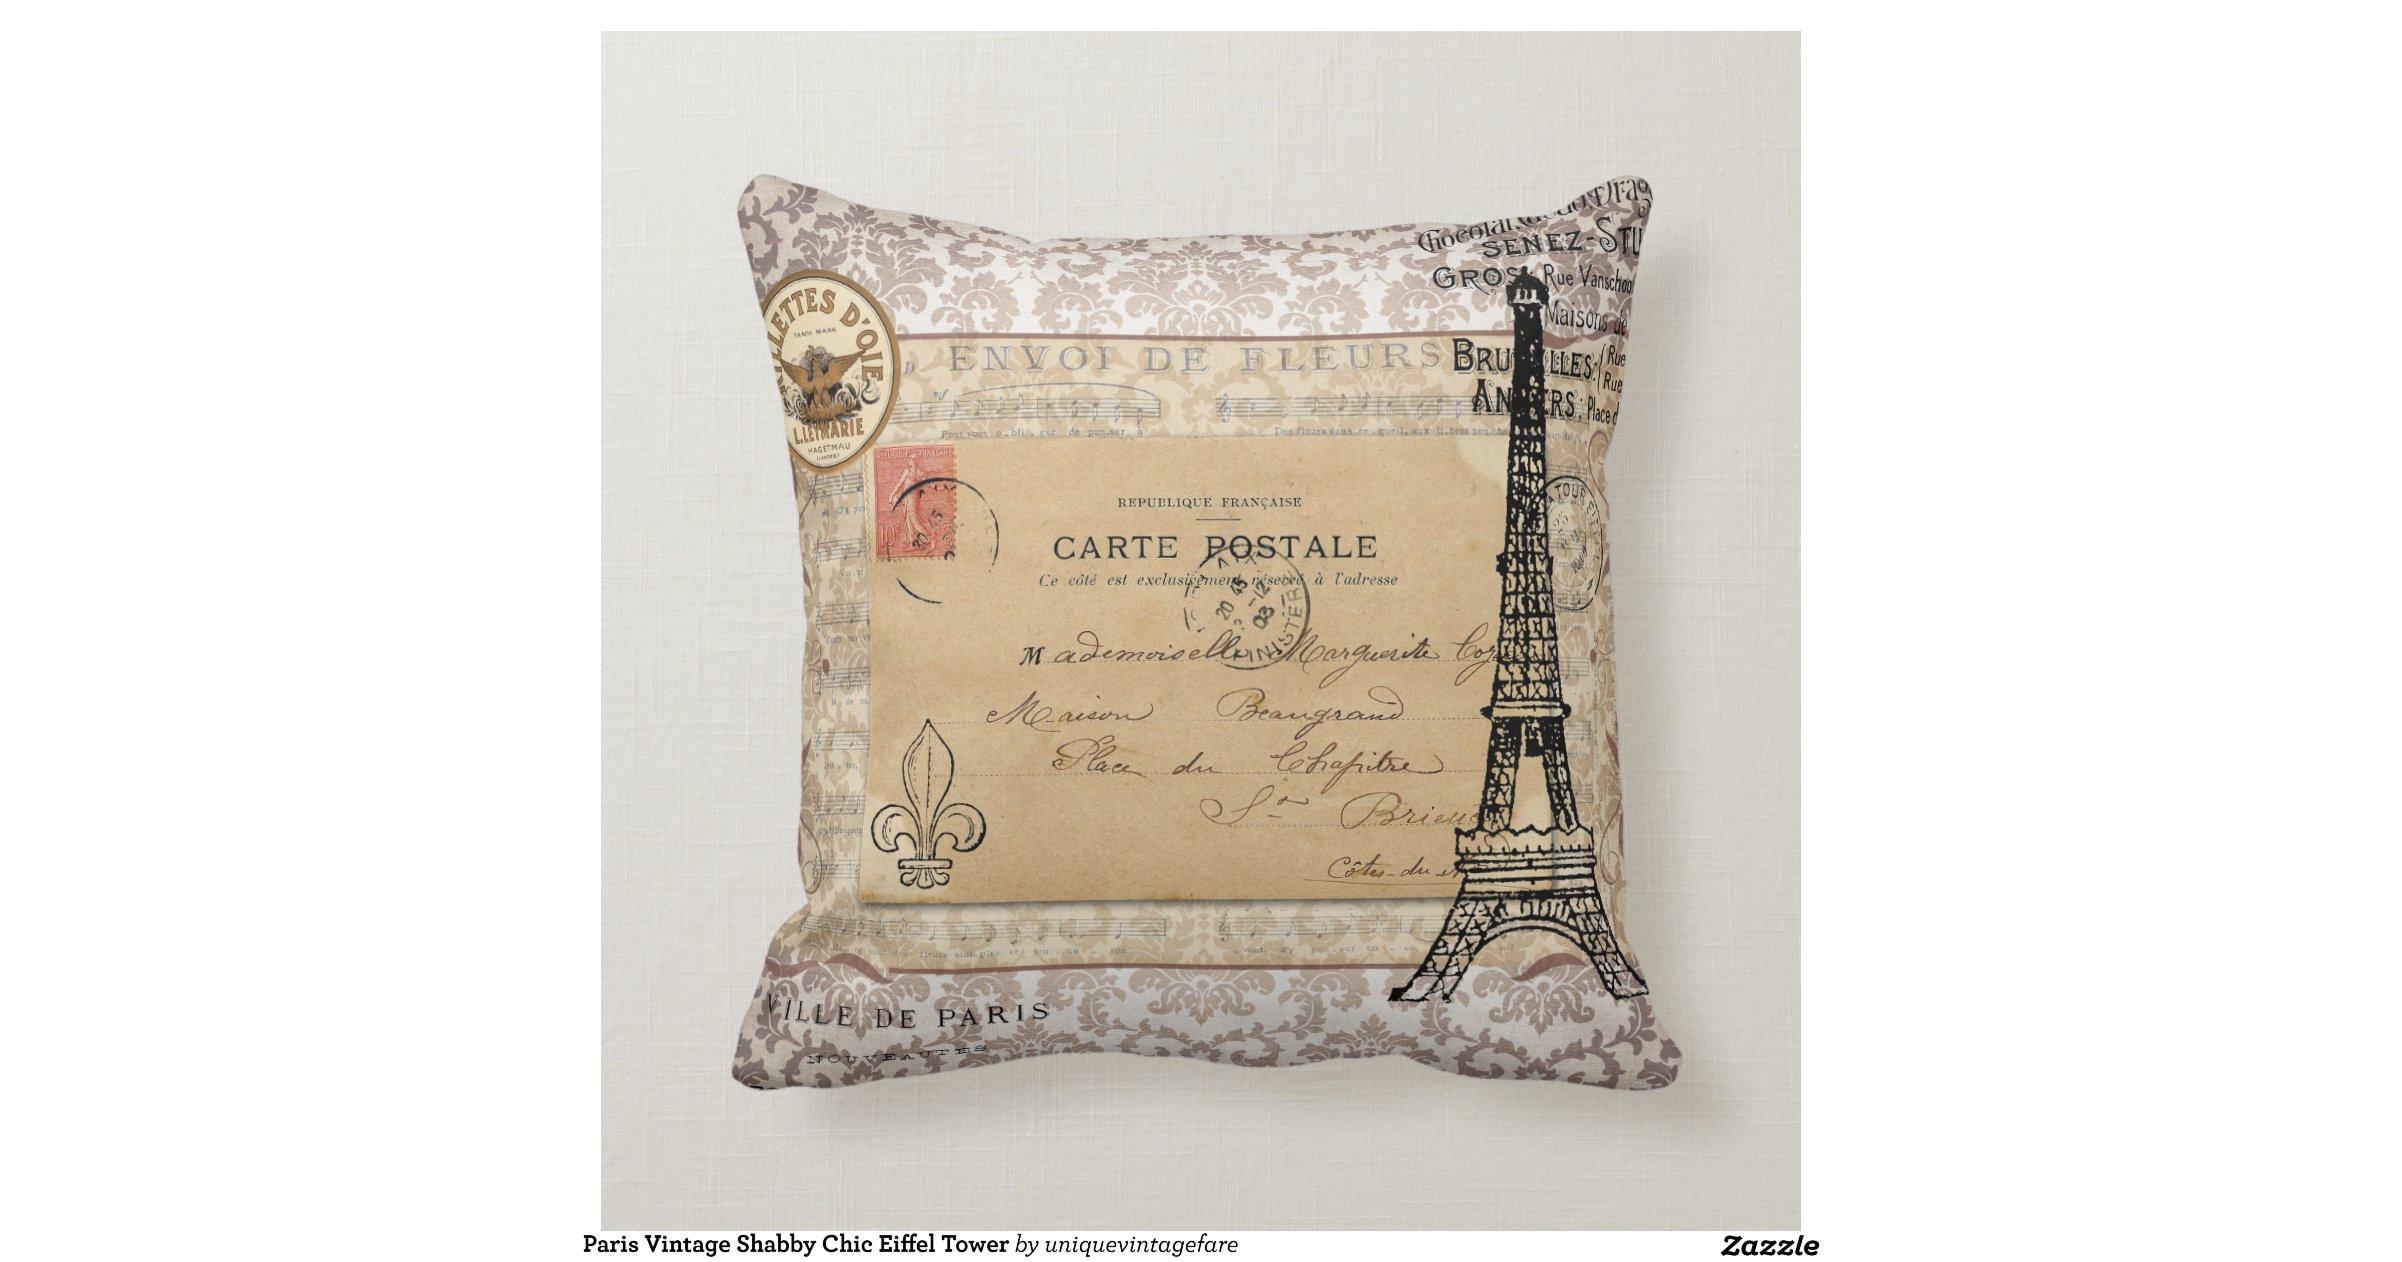 paris vintage shabby chic eiffel tower throw cushions zazzle. Black Bedroom Furniture Sets. Home Design Ideas